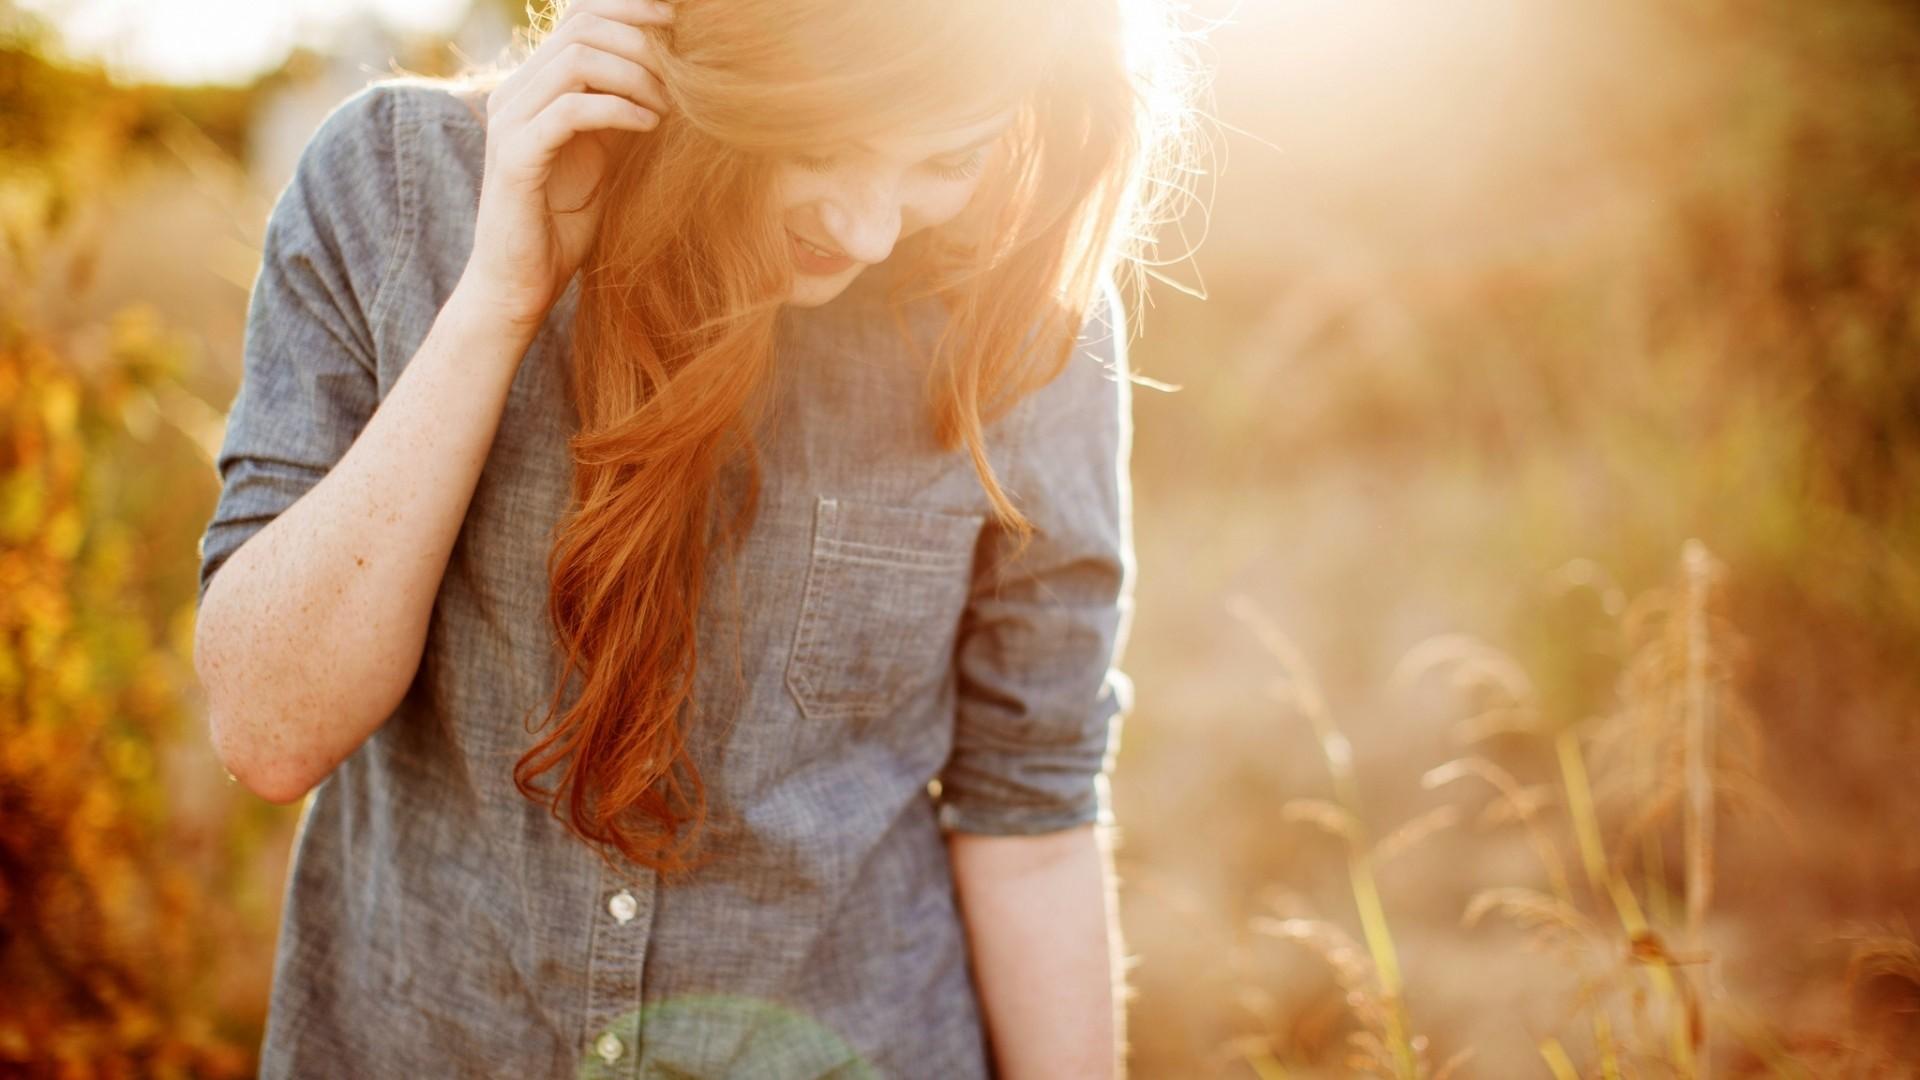 Девушка с рыжими волосами фото без лица